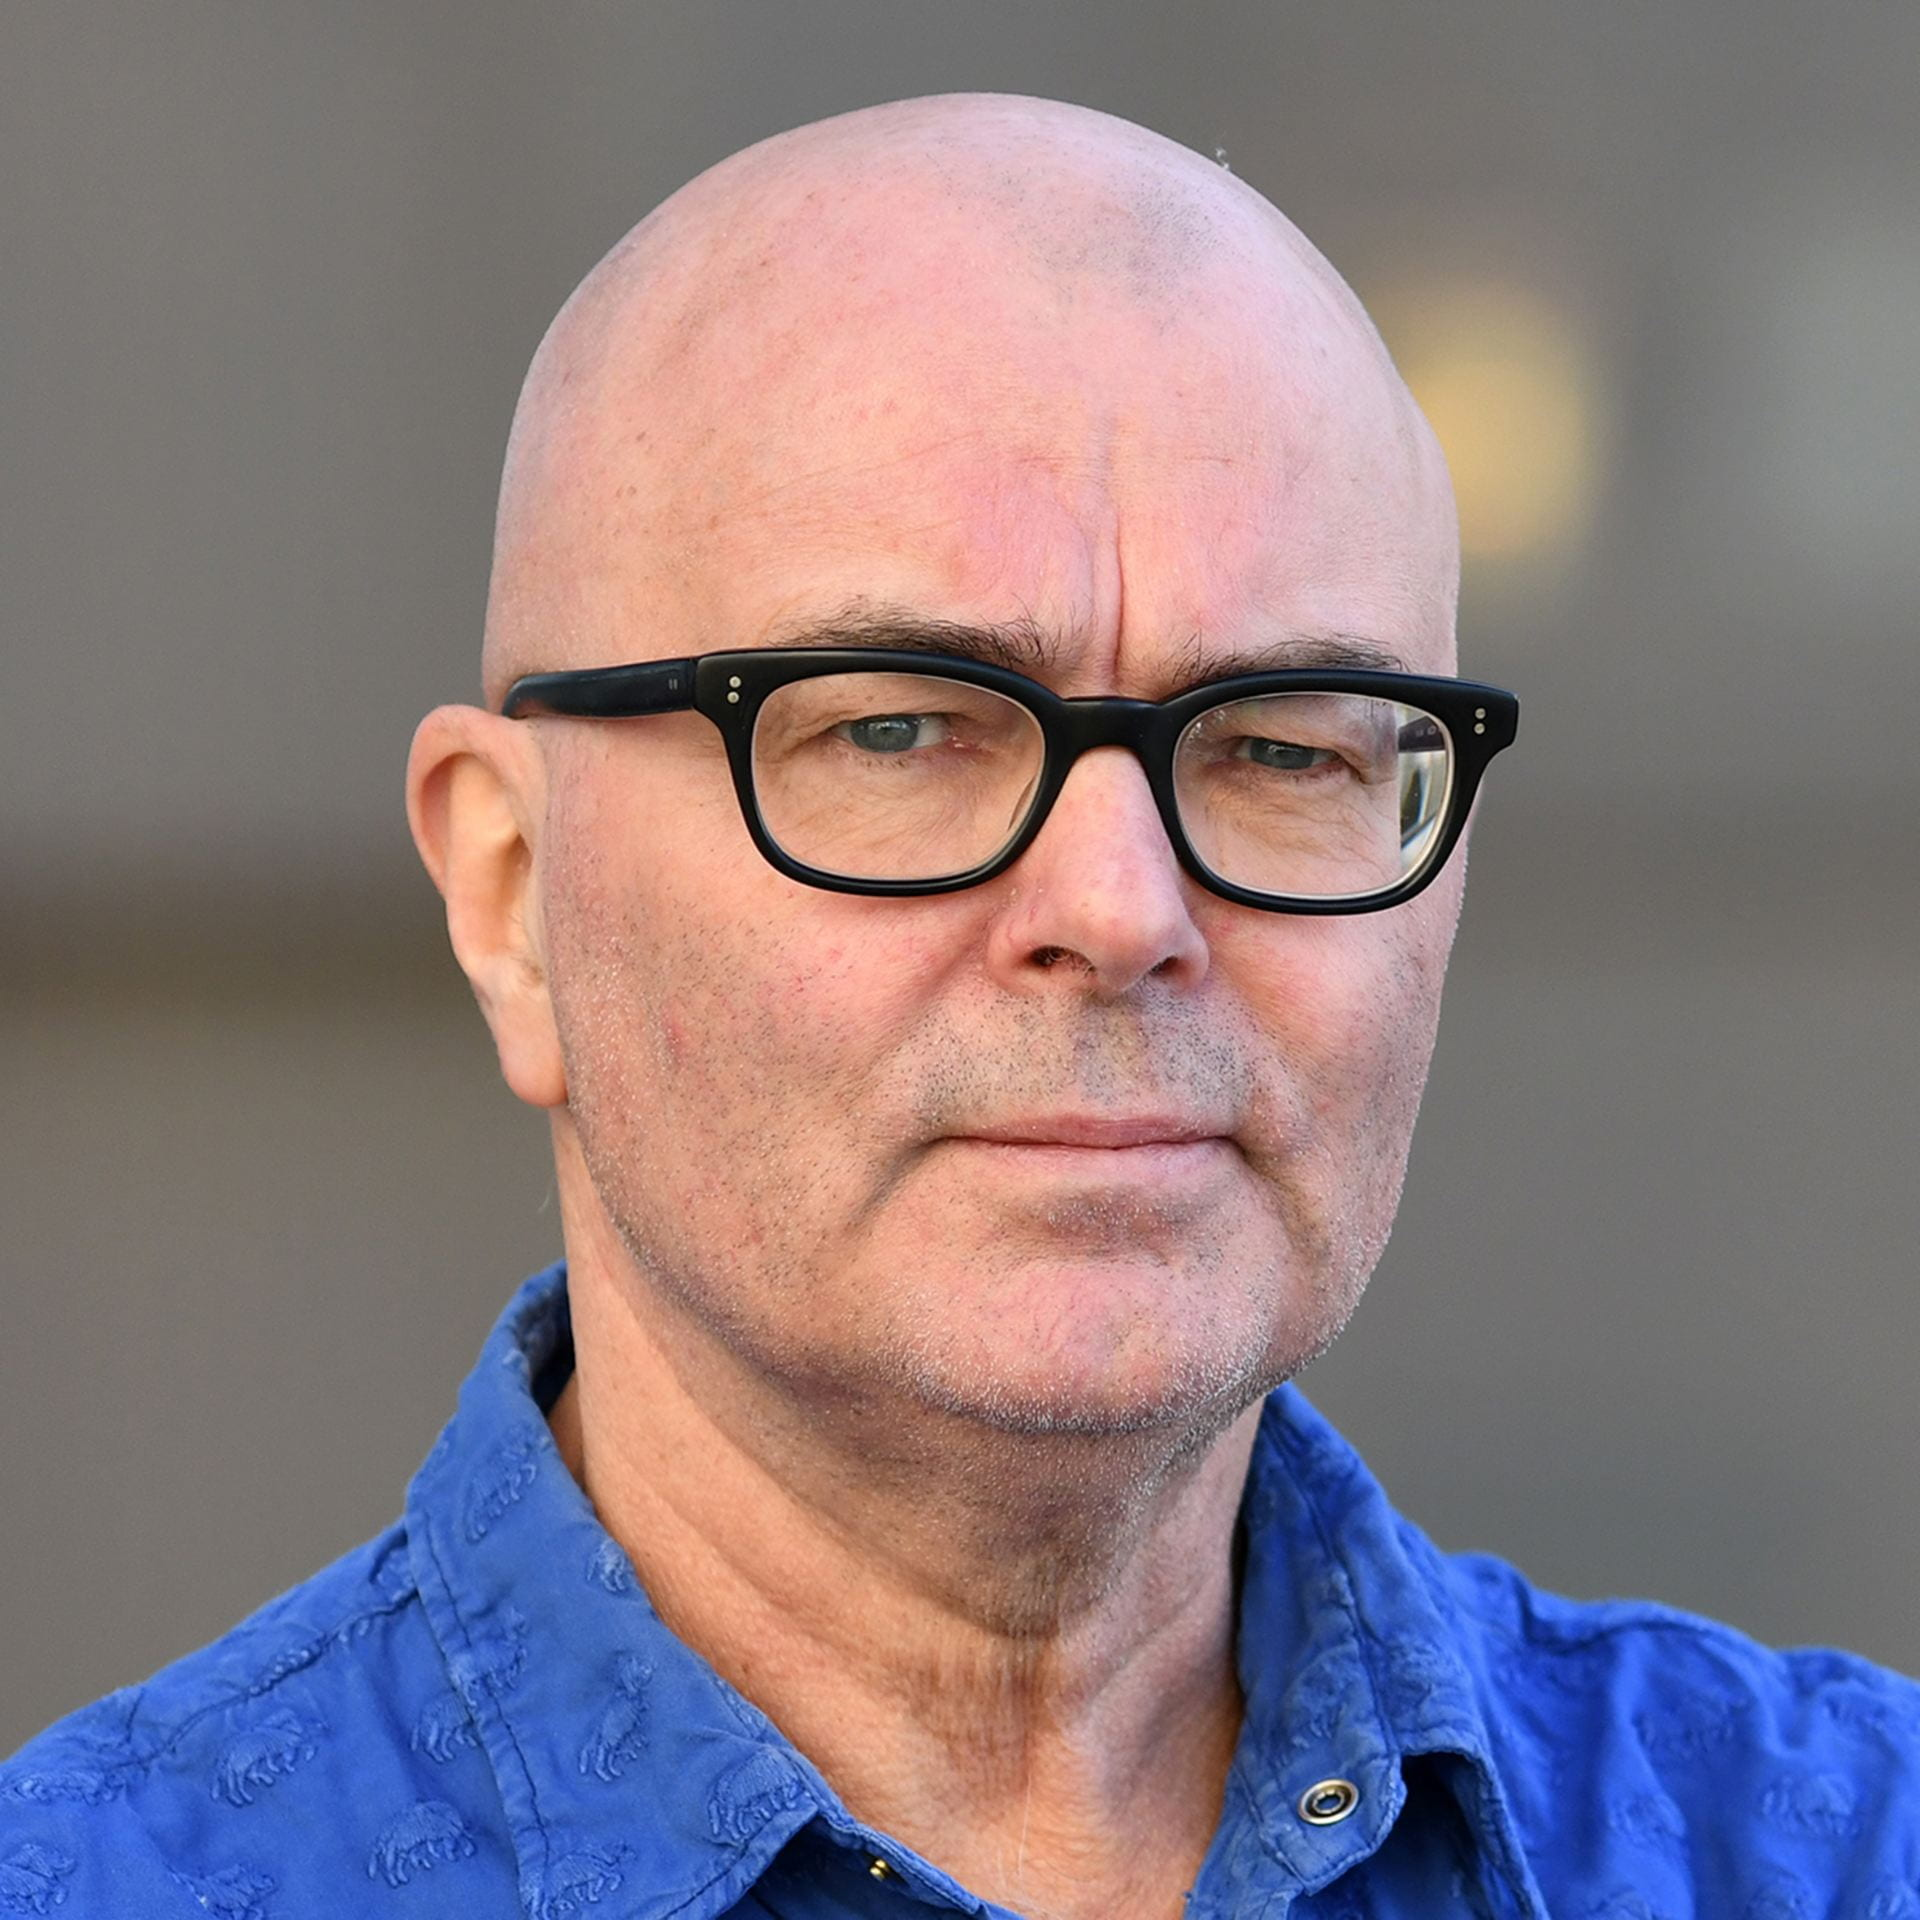 Kjell Salvanes